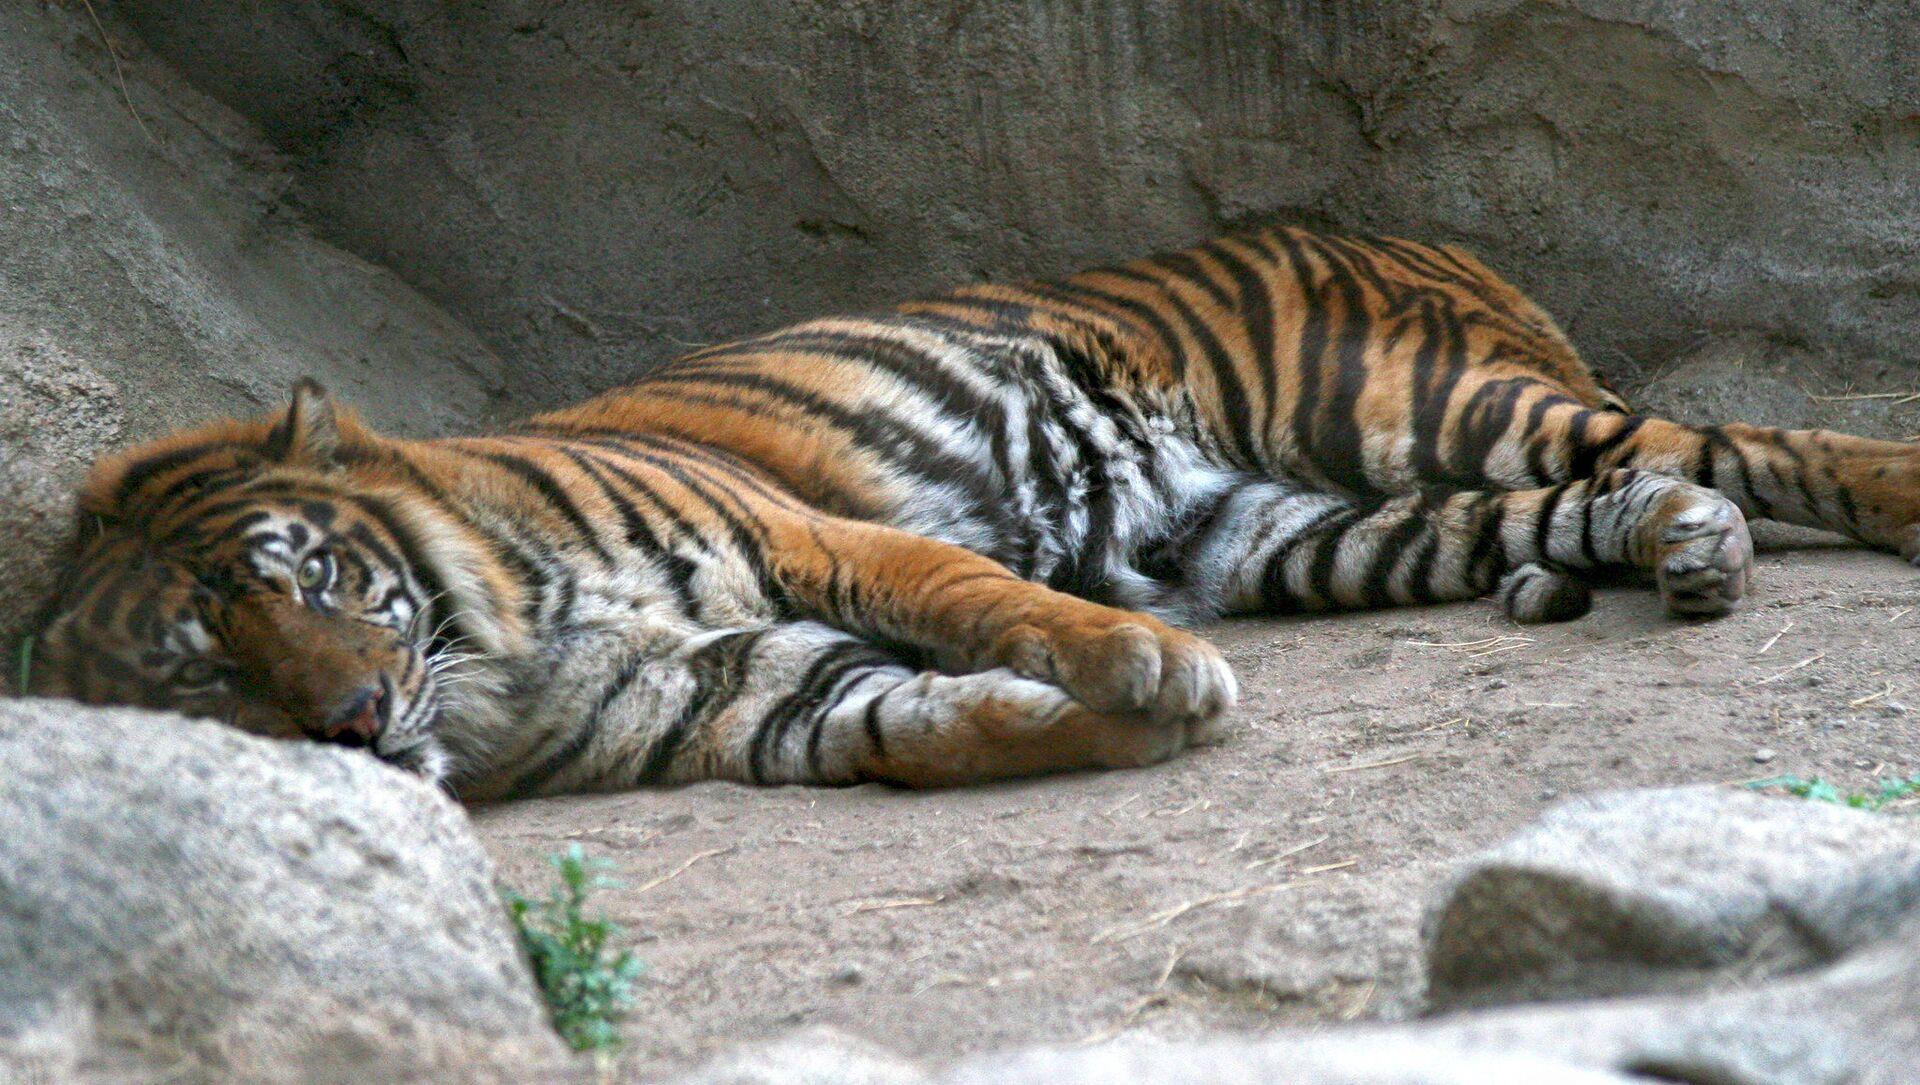 Un tigre de Sumatra (image d'illustration) - Sputnik France, 1920, 01.08.2021